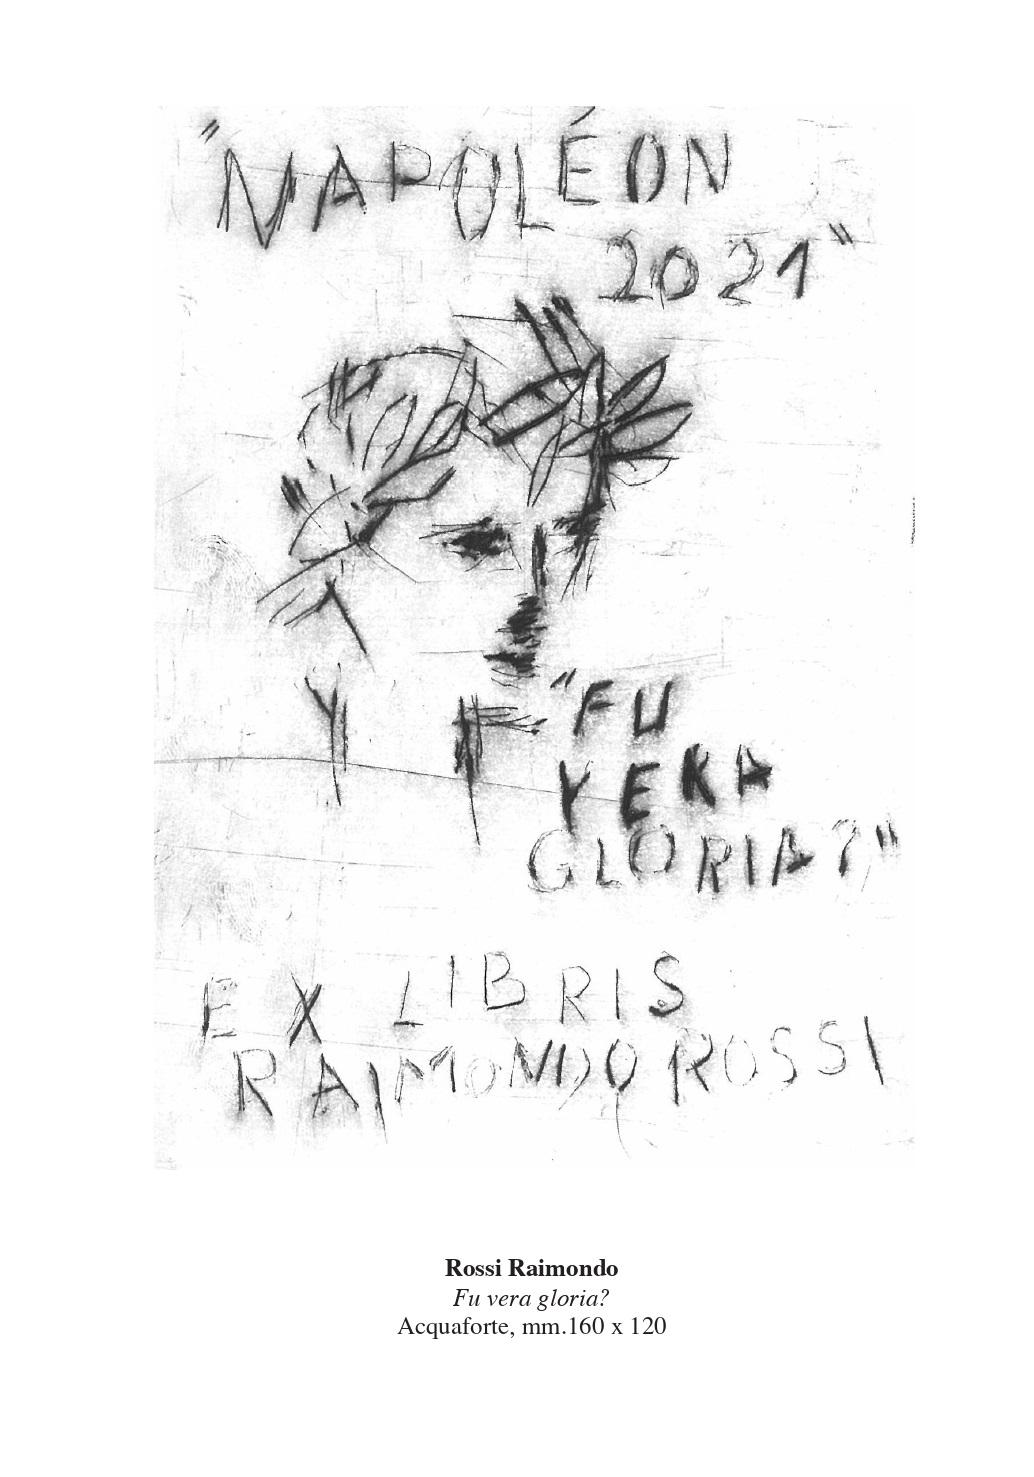 CATALOGO exlibris 2021-130_page-0001